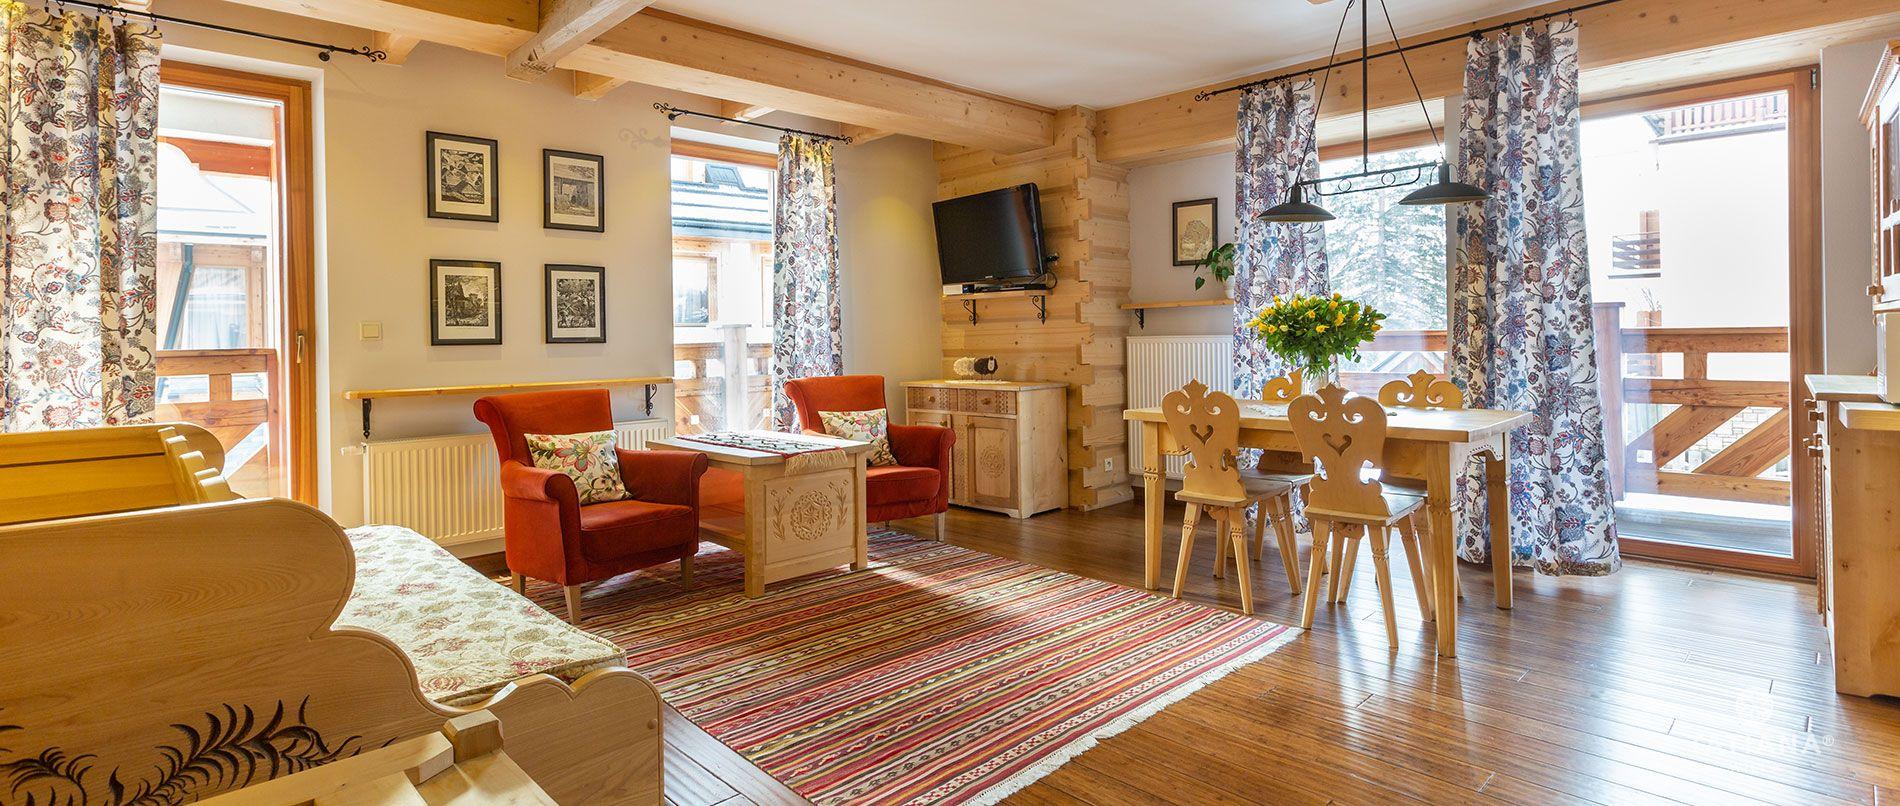 Apartament Lux 12- salon